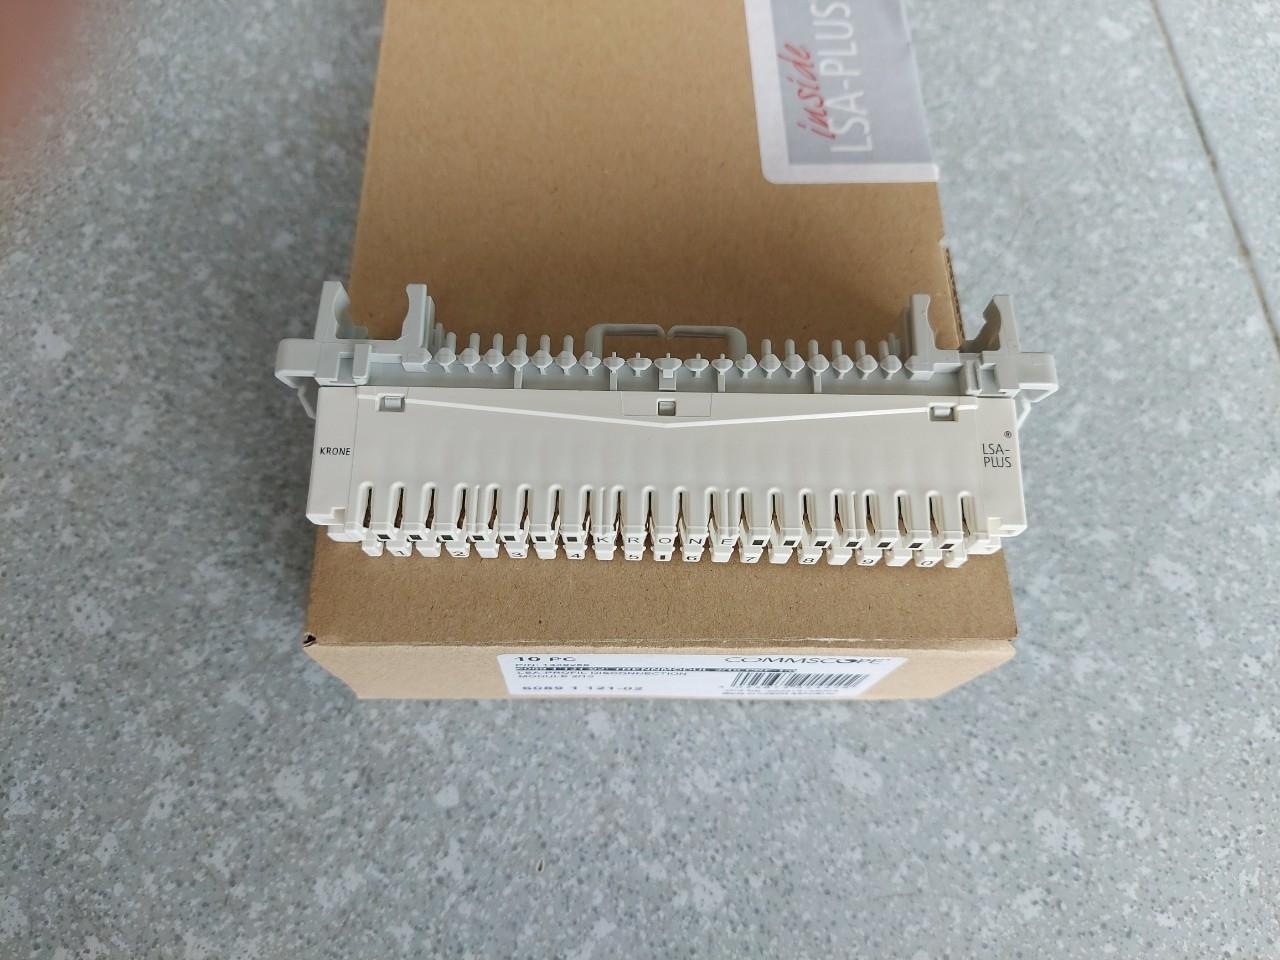 Phiến đấu dây KRONE 6089 1 121-02 COMMSCOPE 1349256